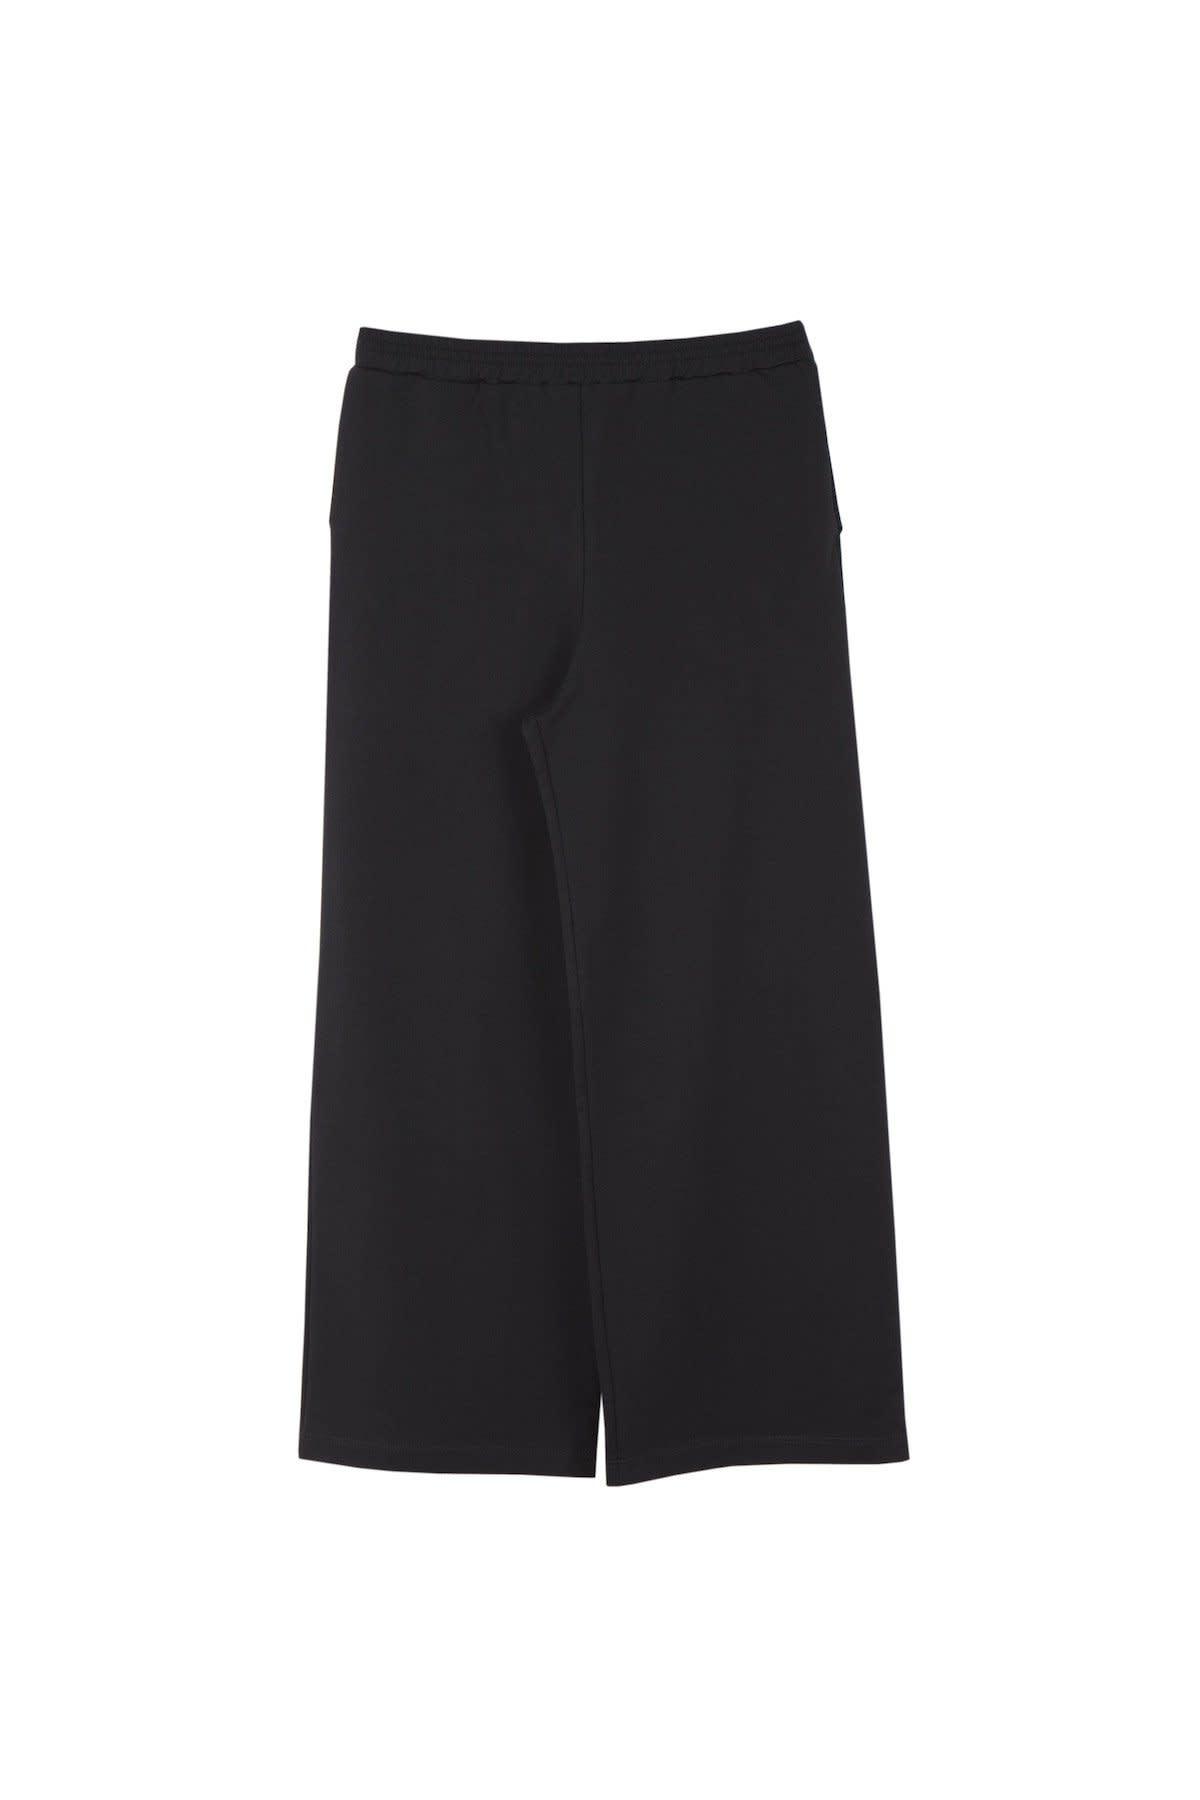 Arela Studio Hadley Cotton Trousers